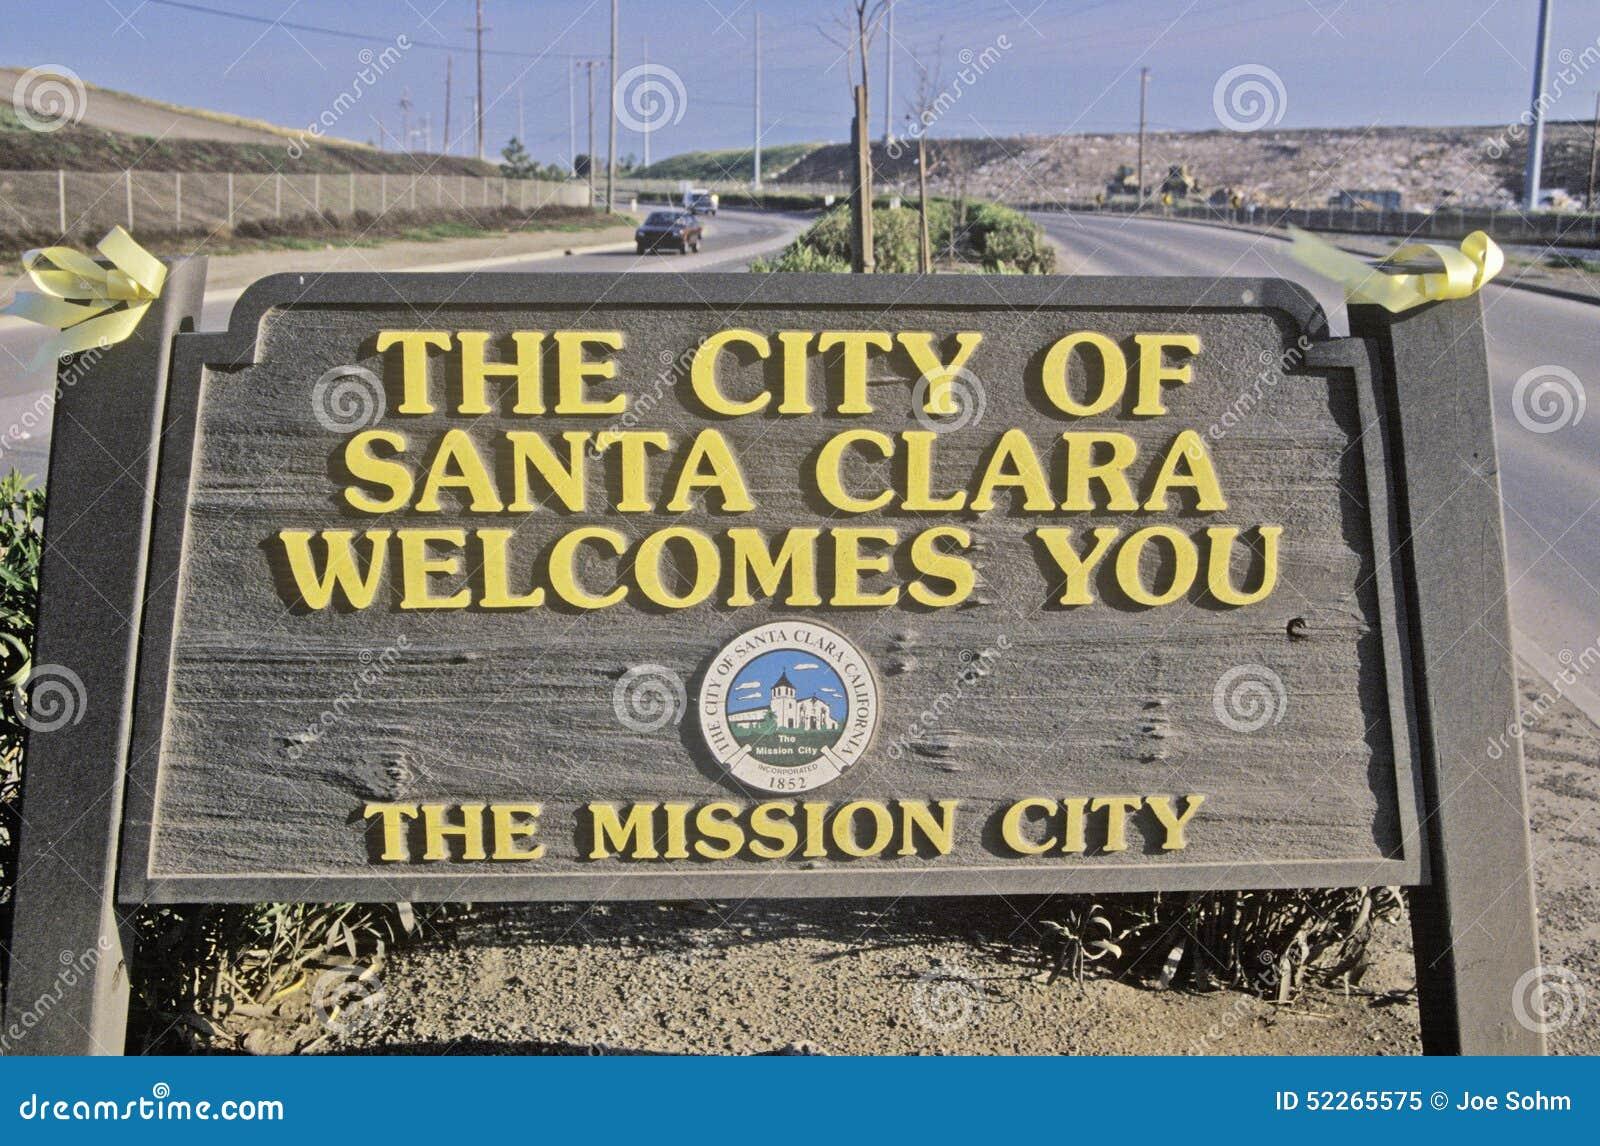 ï ¿ ½ miasto Santa Clara Wita Youï ¿ ½ znaka, Santa Clara, Krzemowa Dolina, Kalifornia